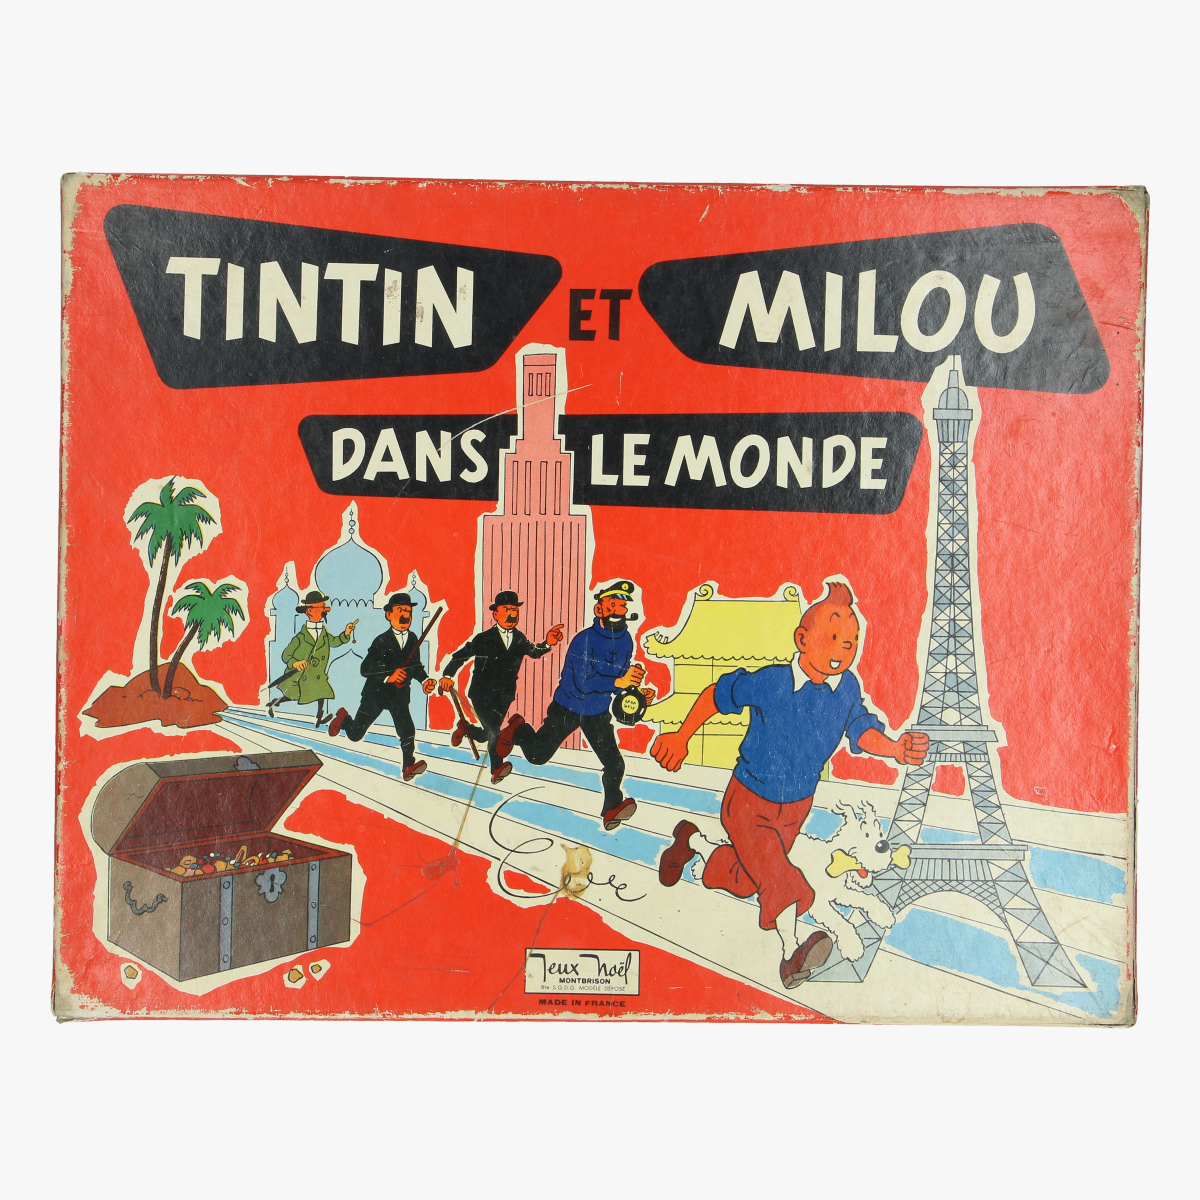 "Afbeeldingen van oude bordspel kuifje '' tintin et milou dans le monde "" made in france"